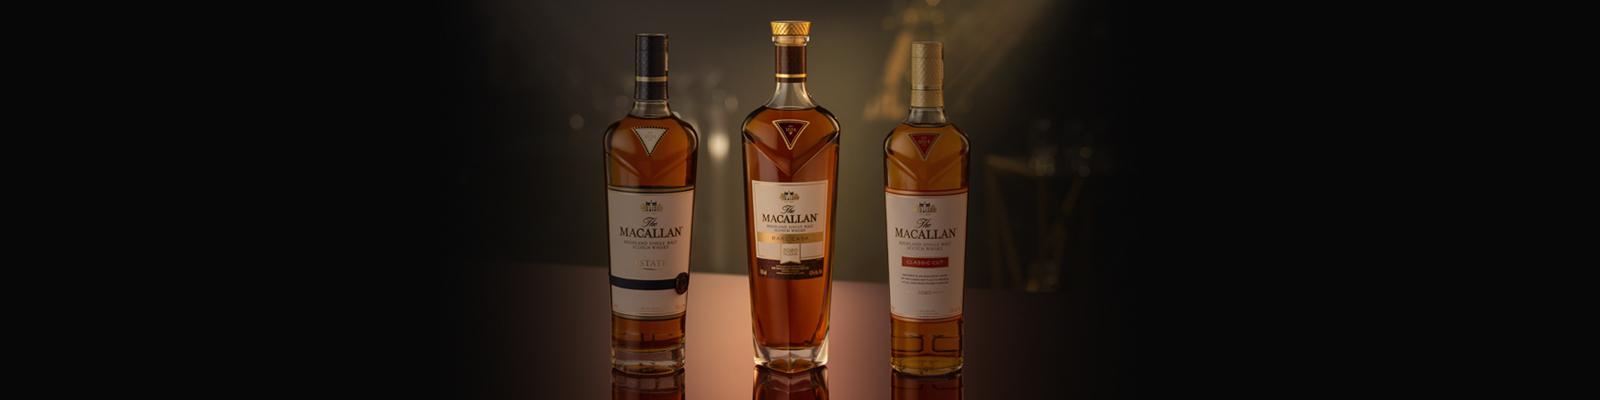 The Macallan Collection